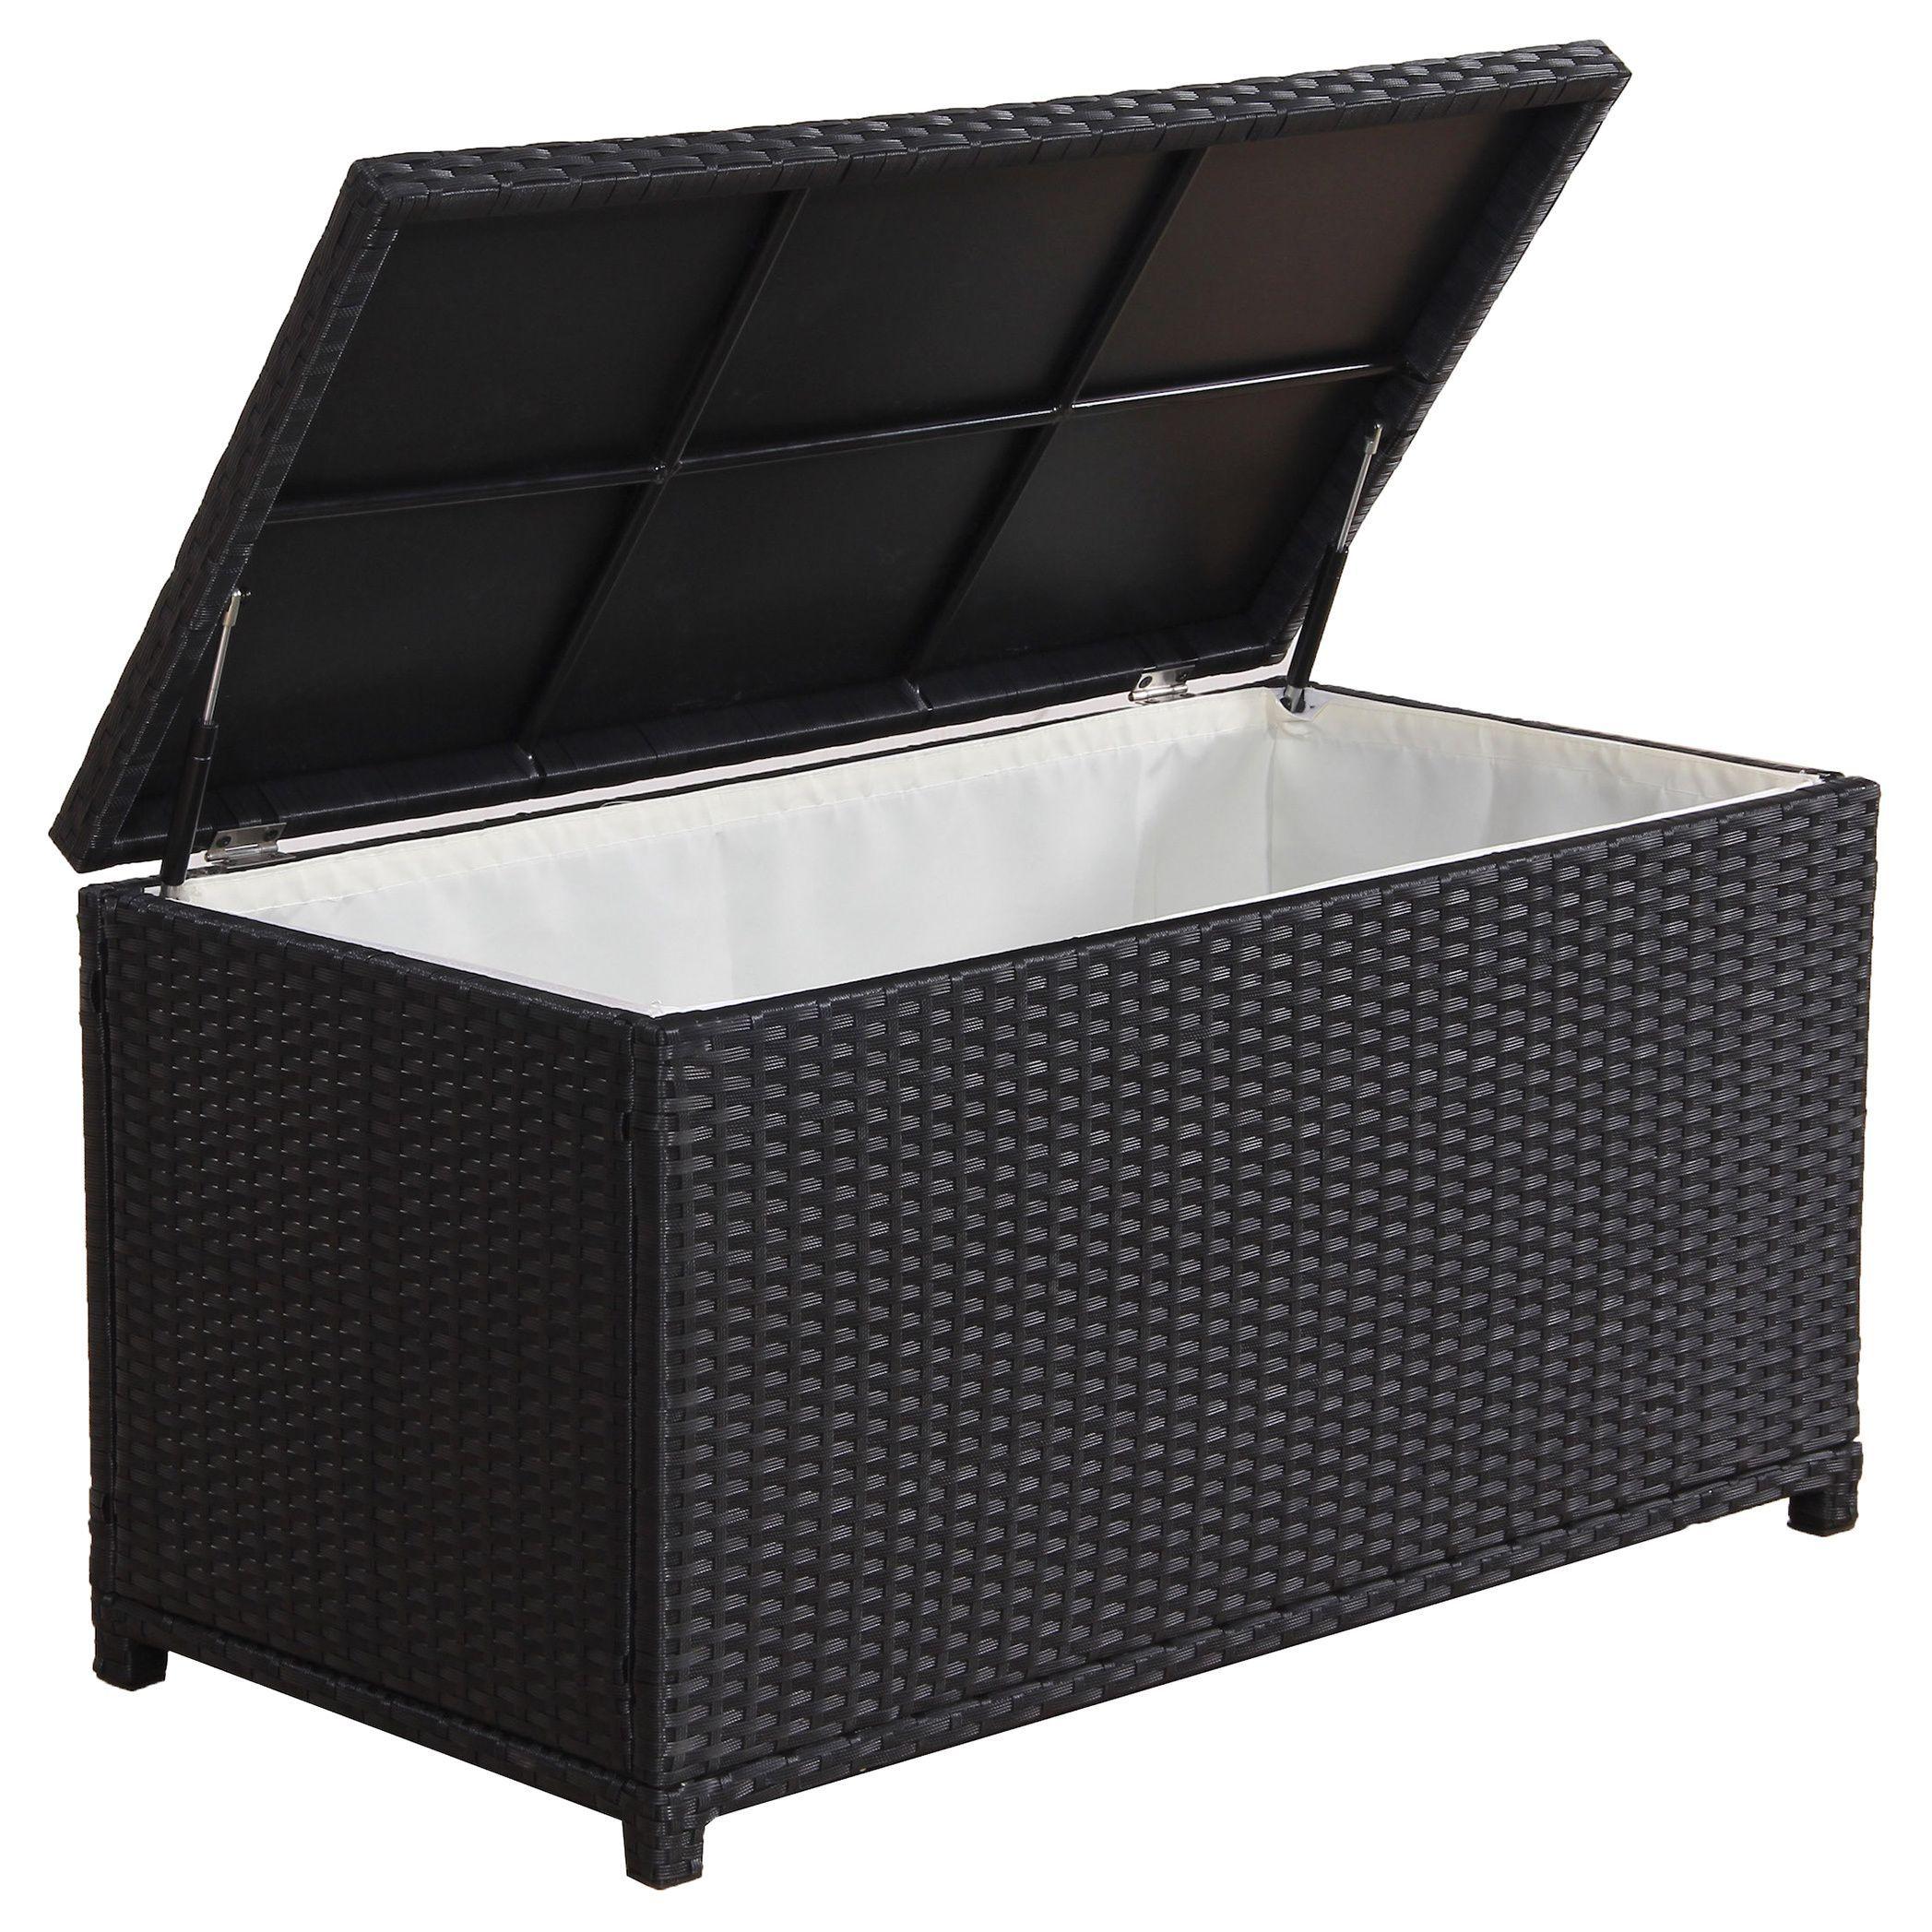 BroyerK Outdoor Black Wicker Cushion Storage Box black Patio